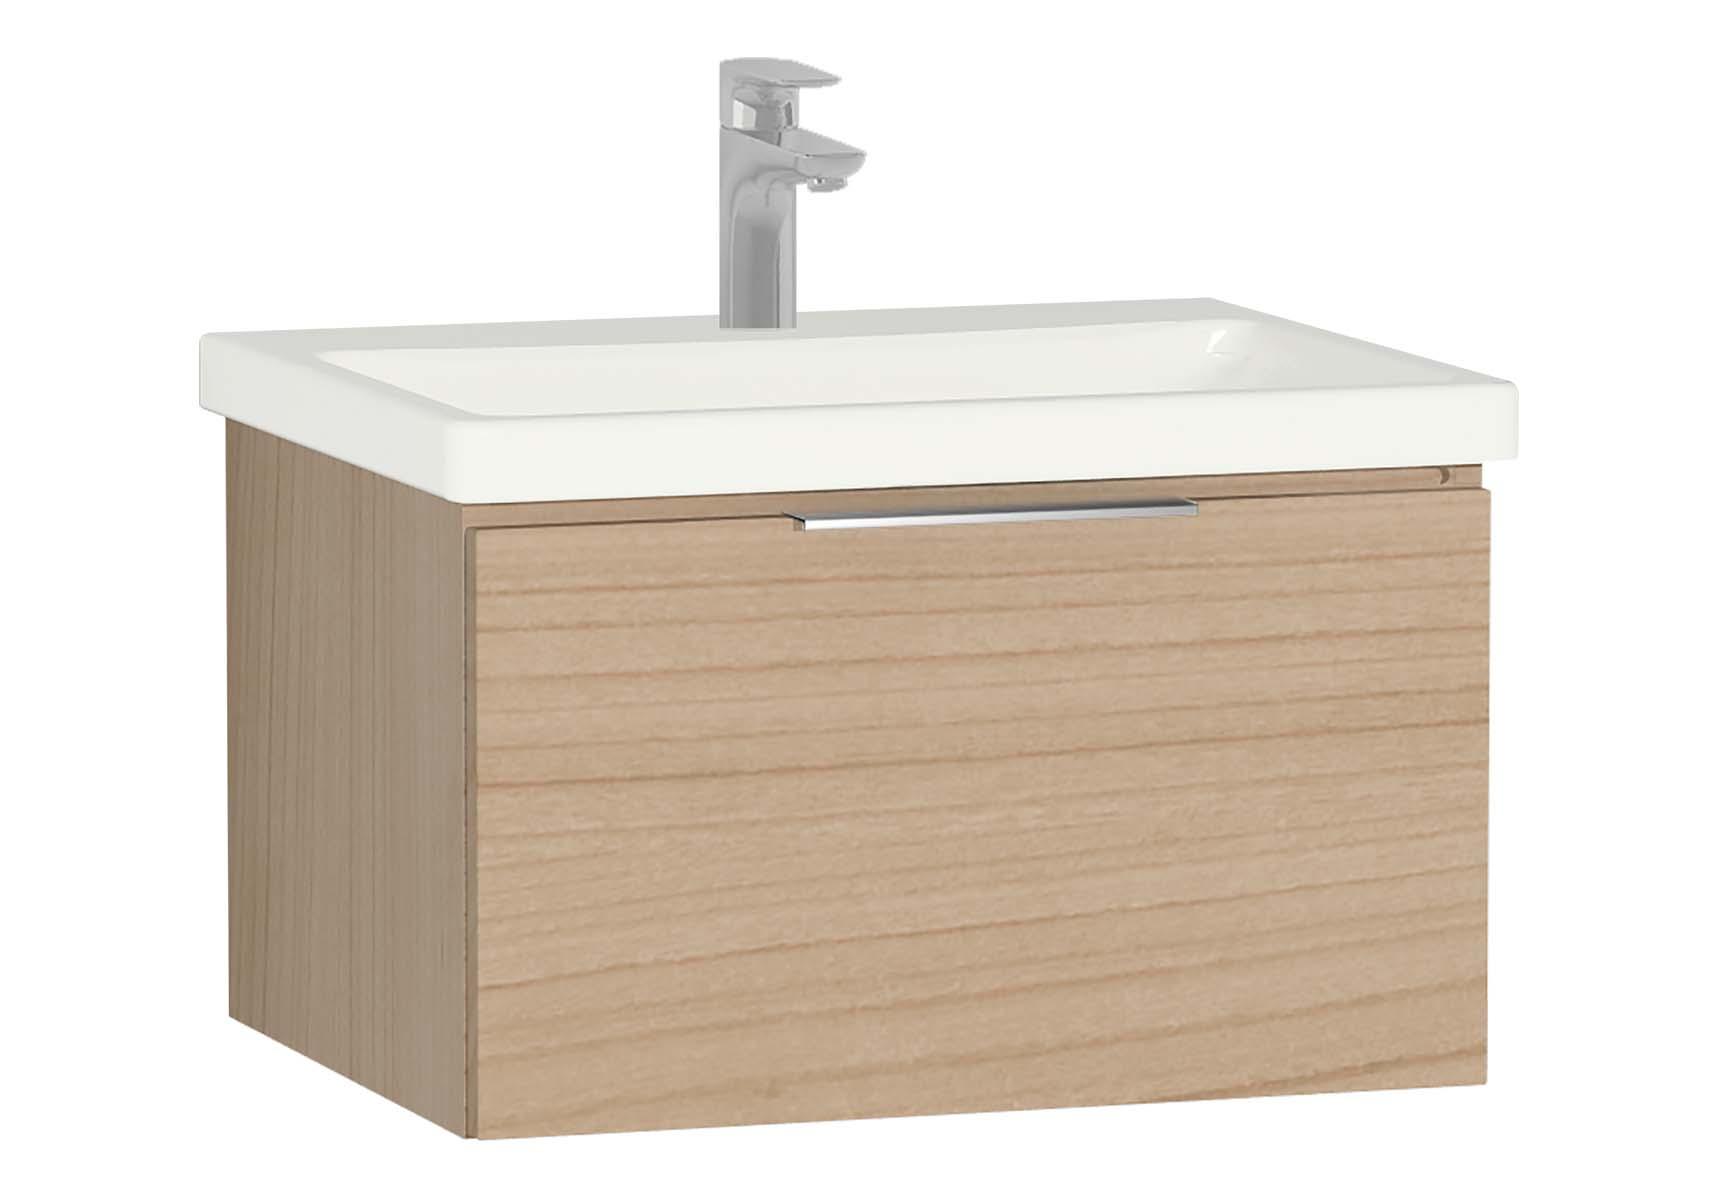 Central Washbasin Unit with 1 drawer, 60 cm, Golden Cherry, Ceramic Washbasin